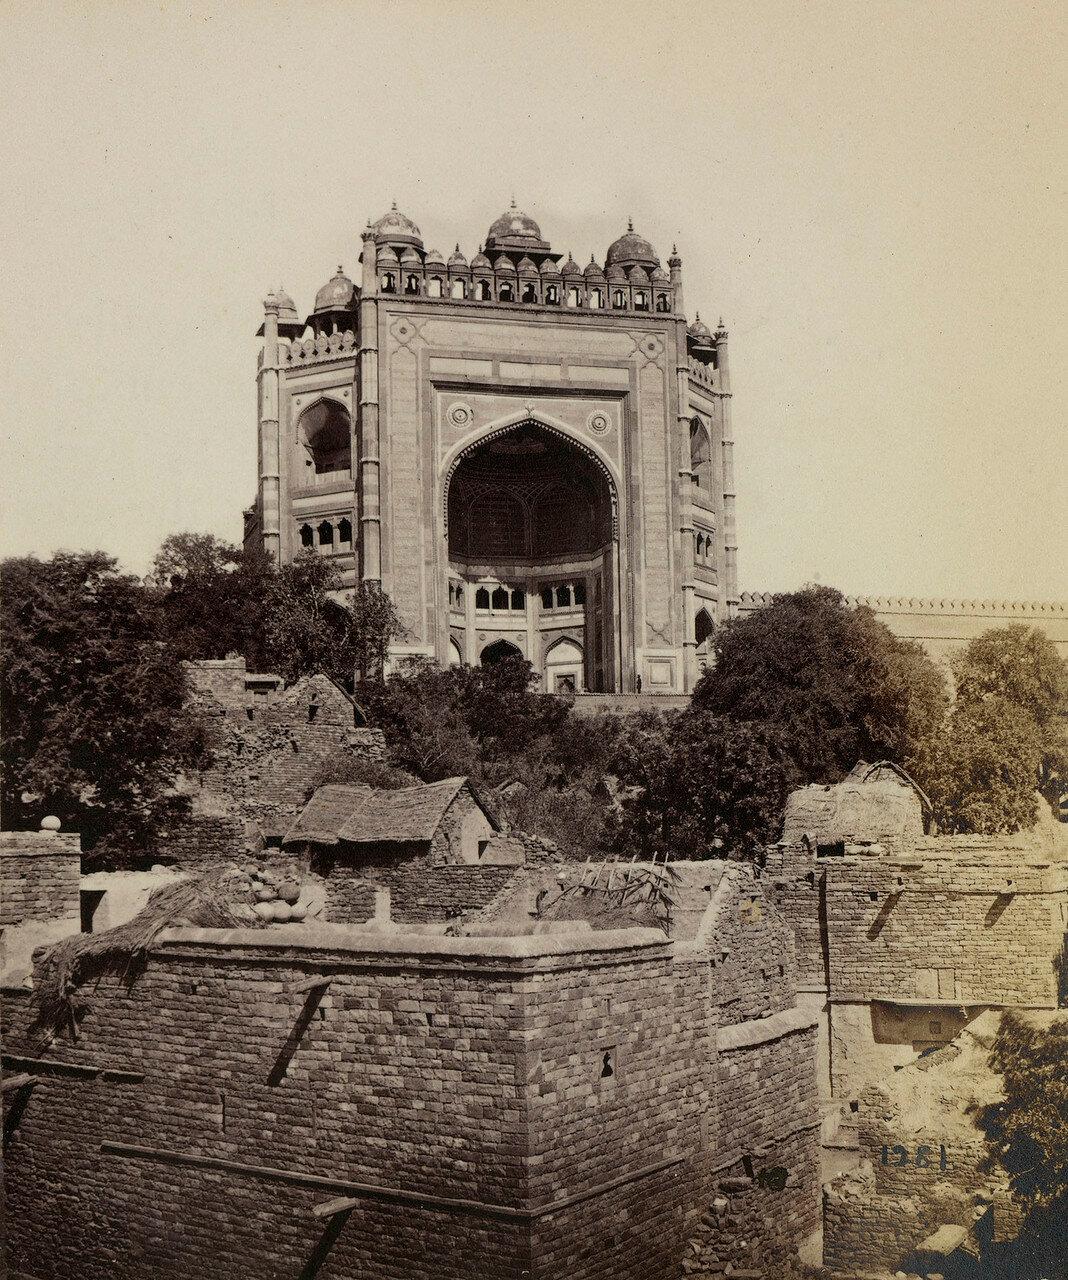 67. Окрестности Акры. Фатехпур-Сикри. Ворота Буланд Дарваза